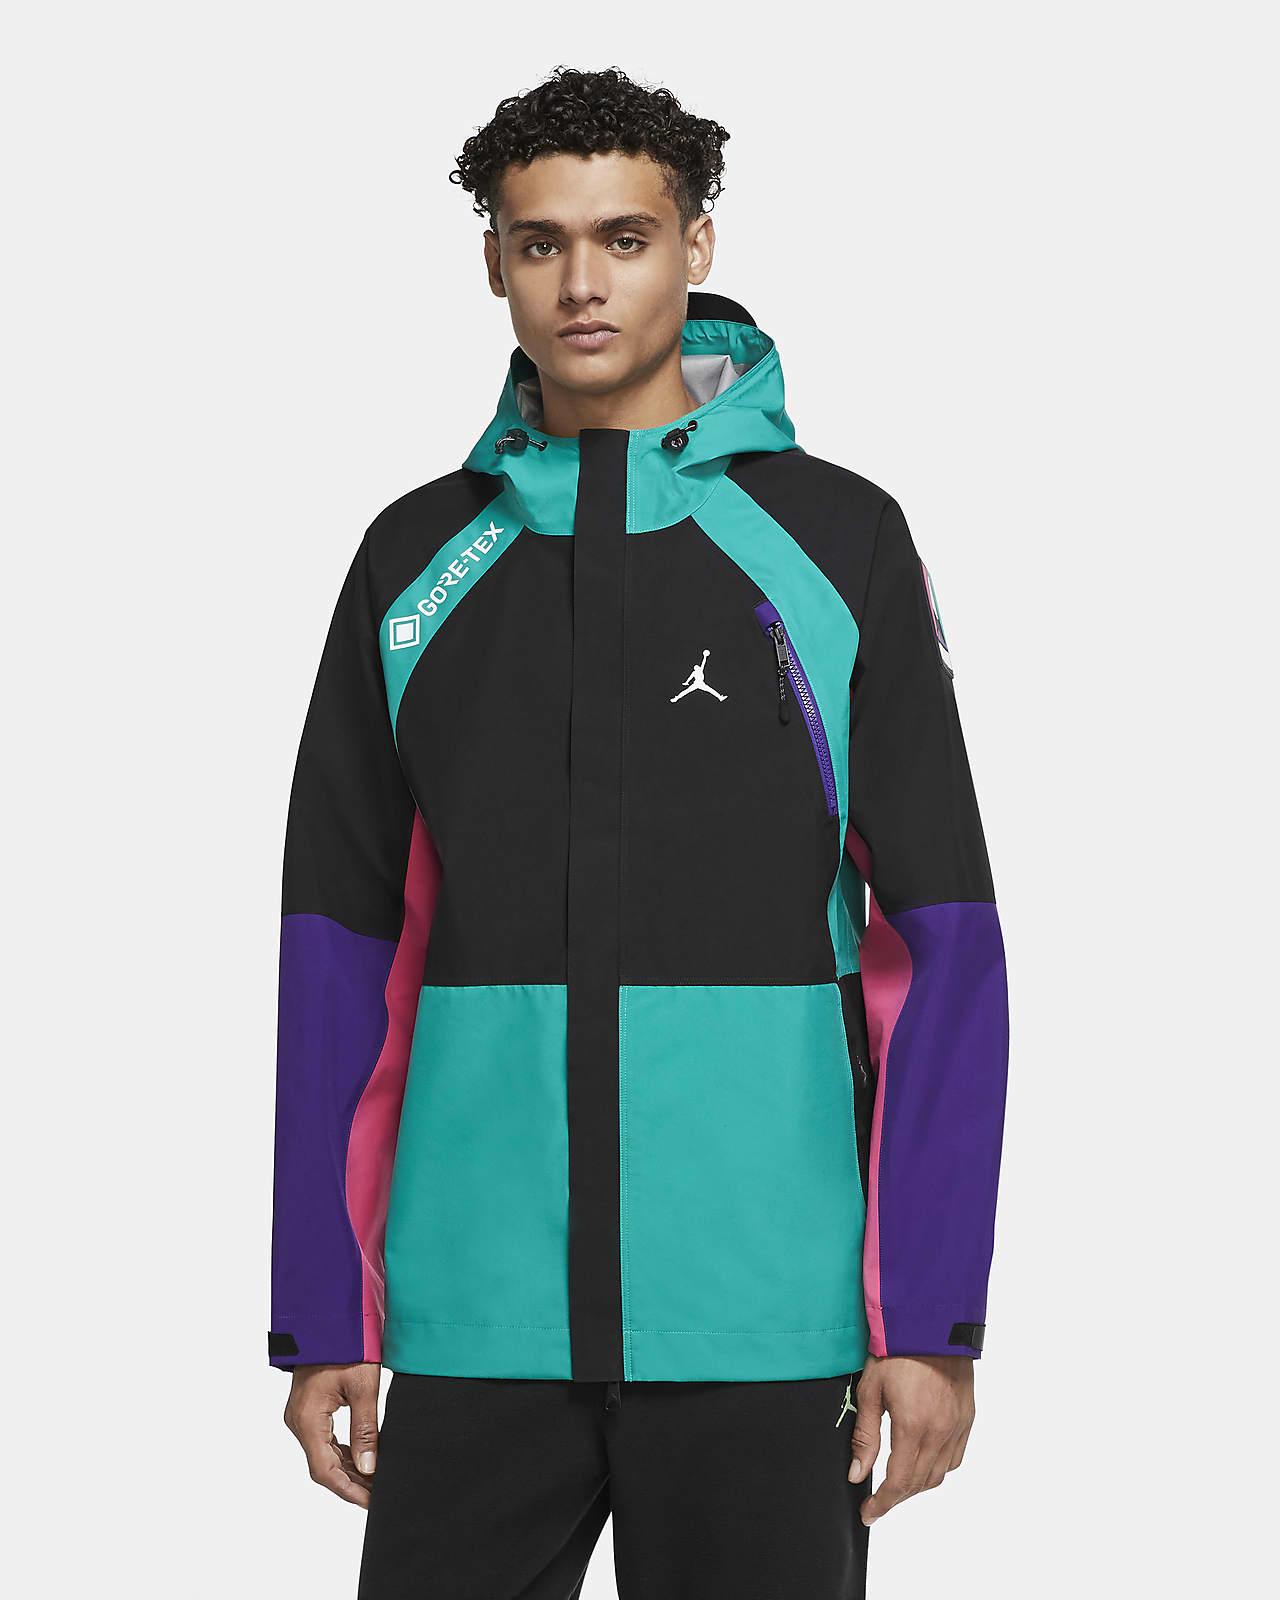 Jordan Winter Utility GORE-TEX Men's Jacket